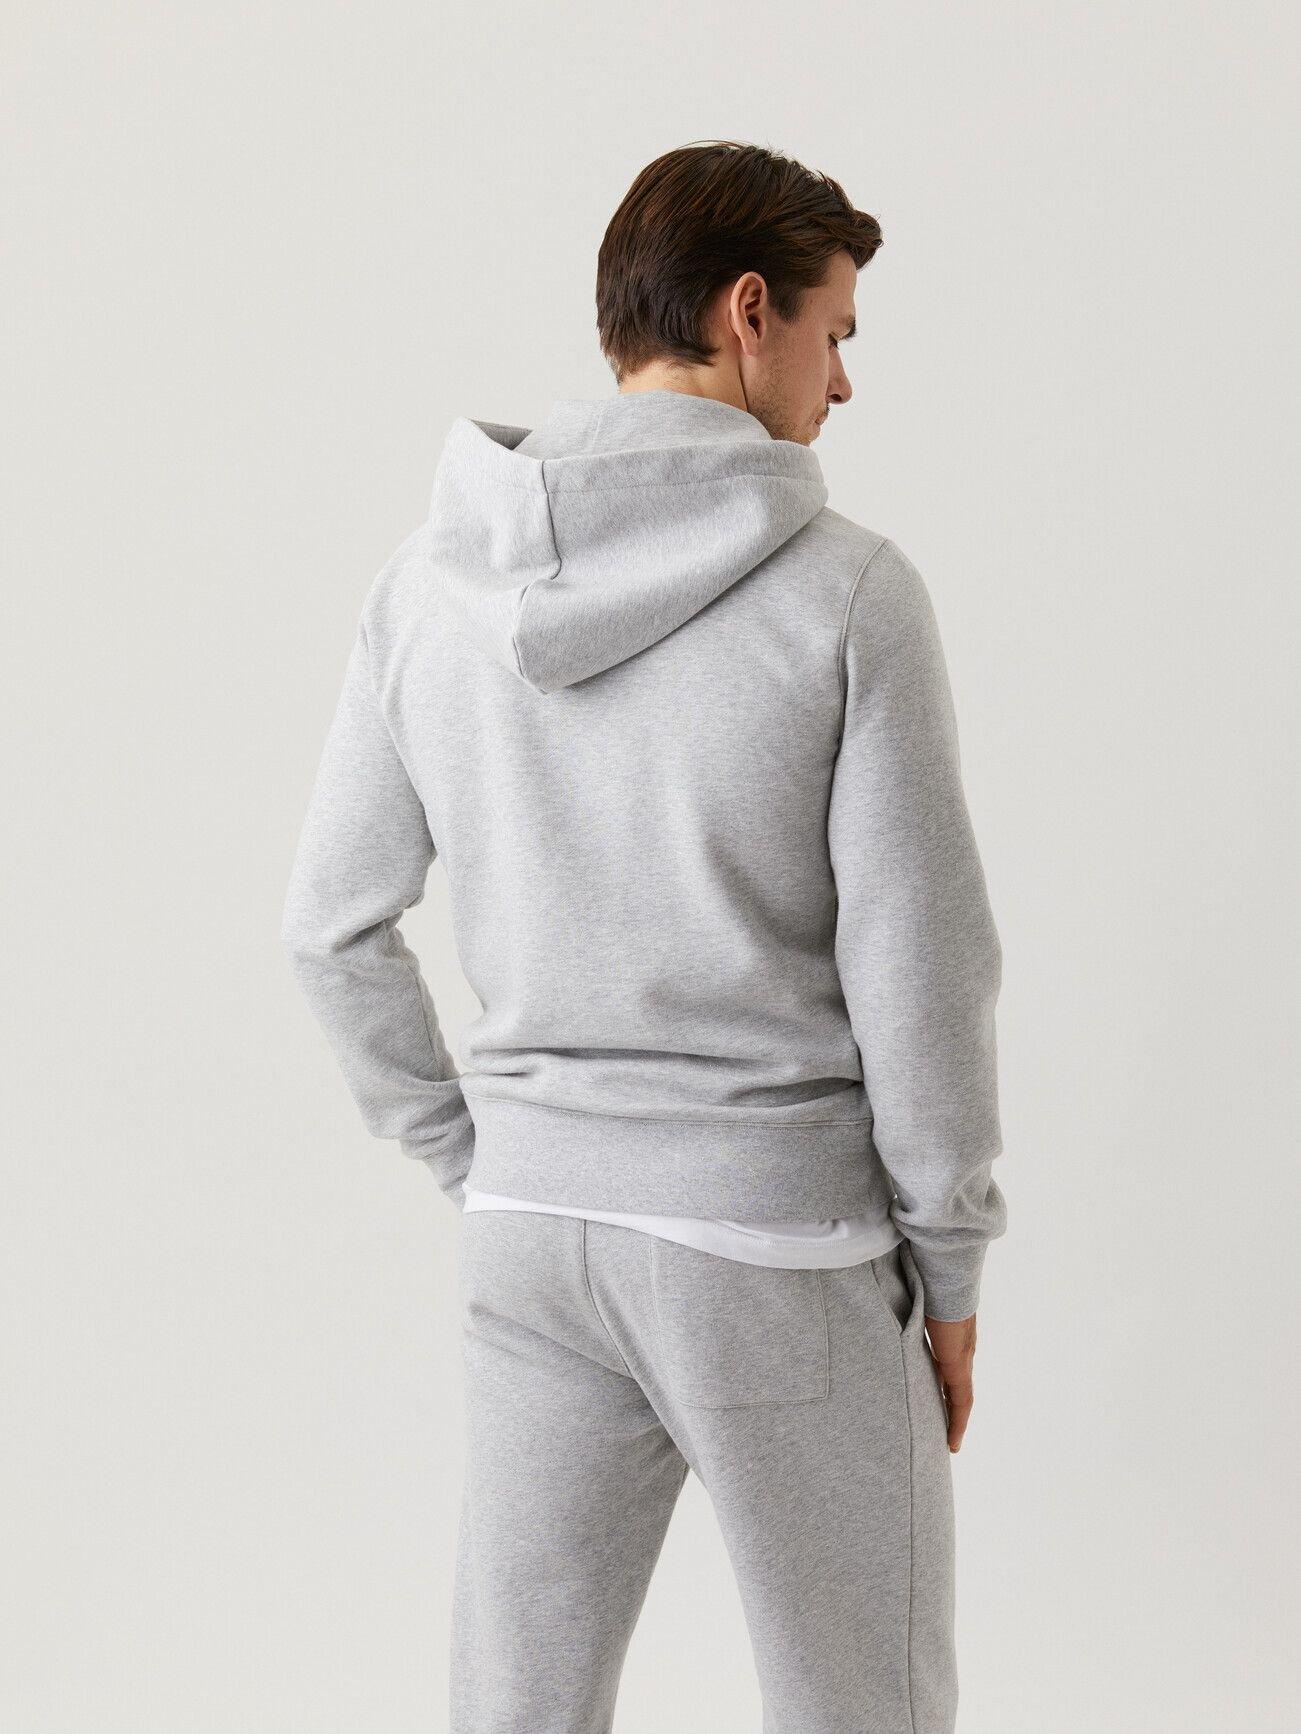 Centre Hoodie - Light Grey Melange